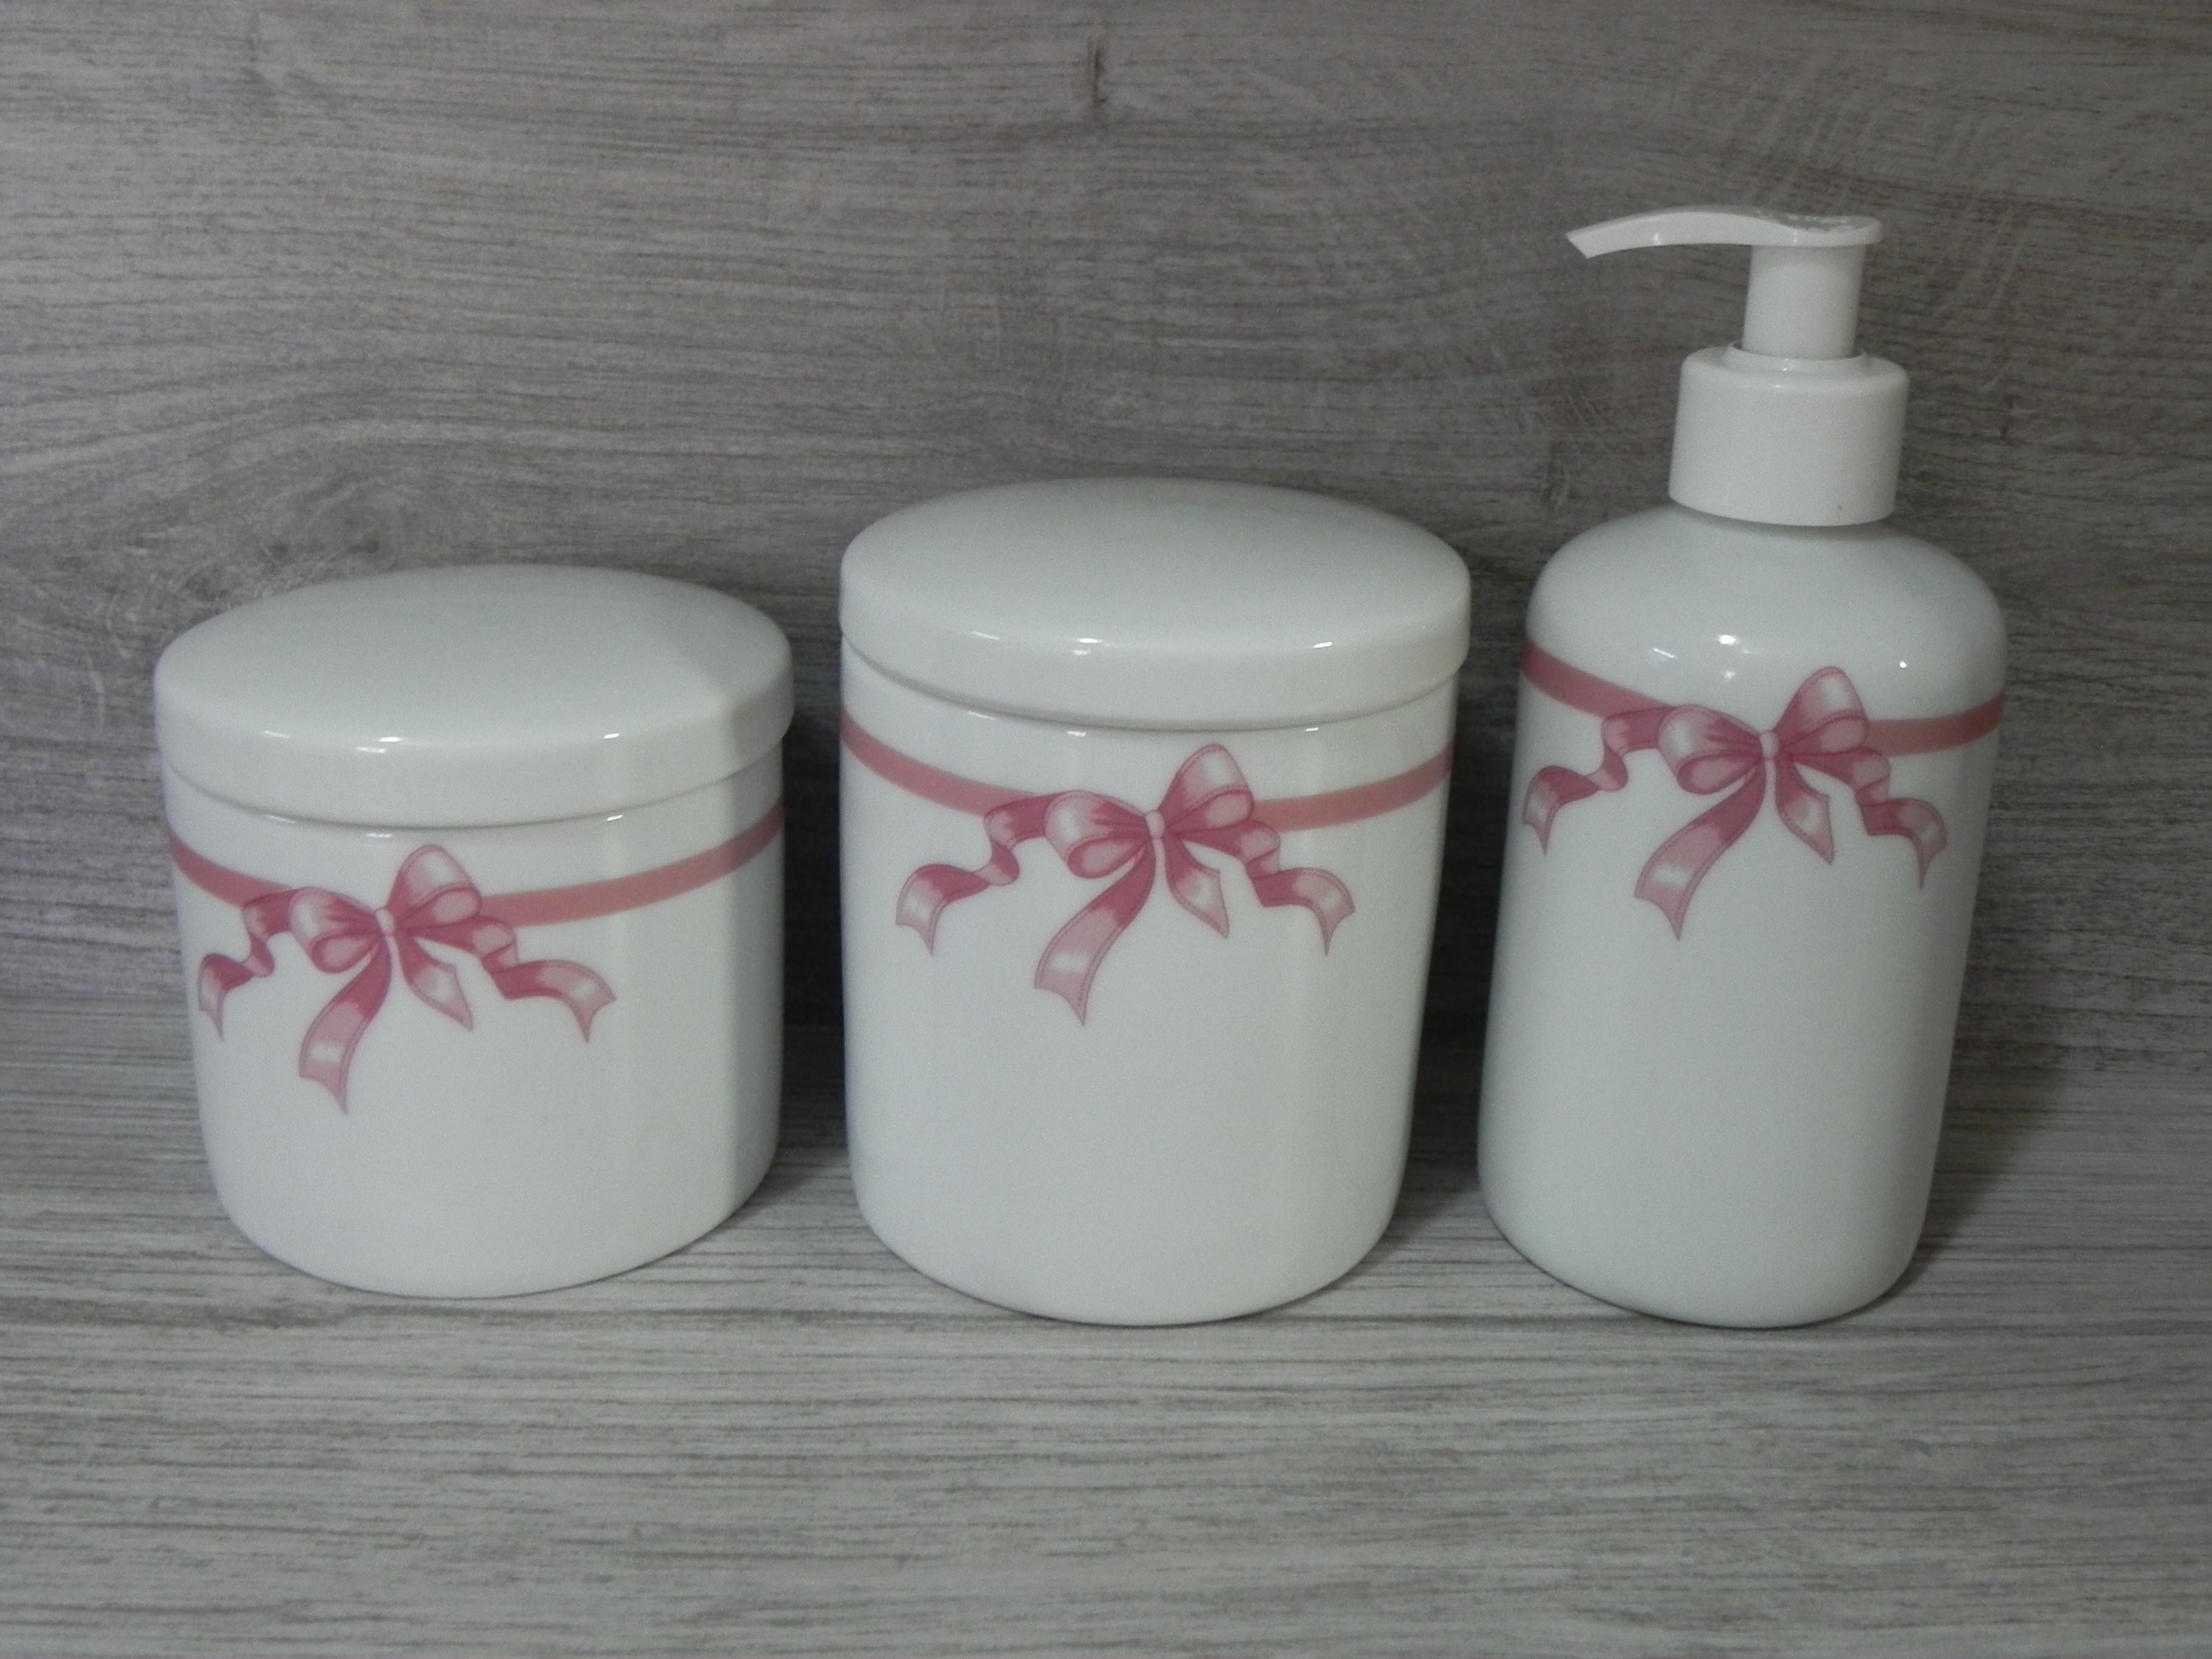 Kit Higiene Porcelana Banheiro 3 Pç Laço Rosa Pote Dispenser